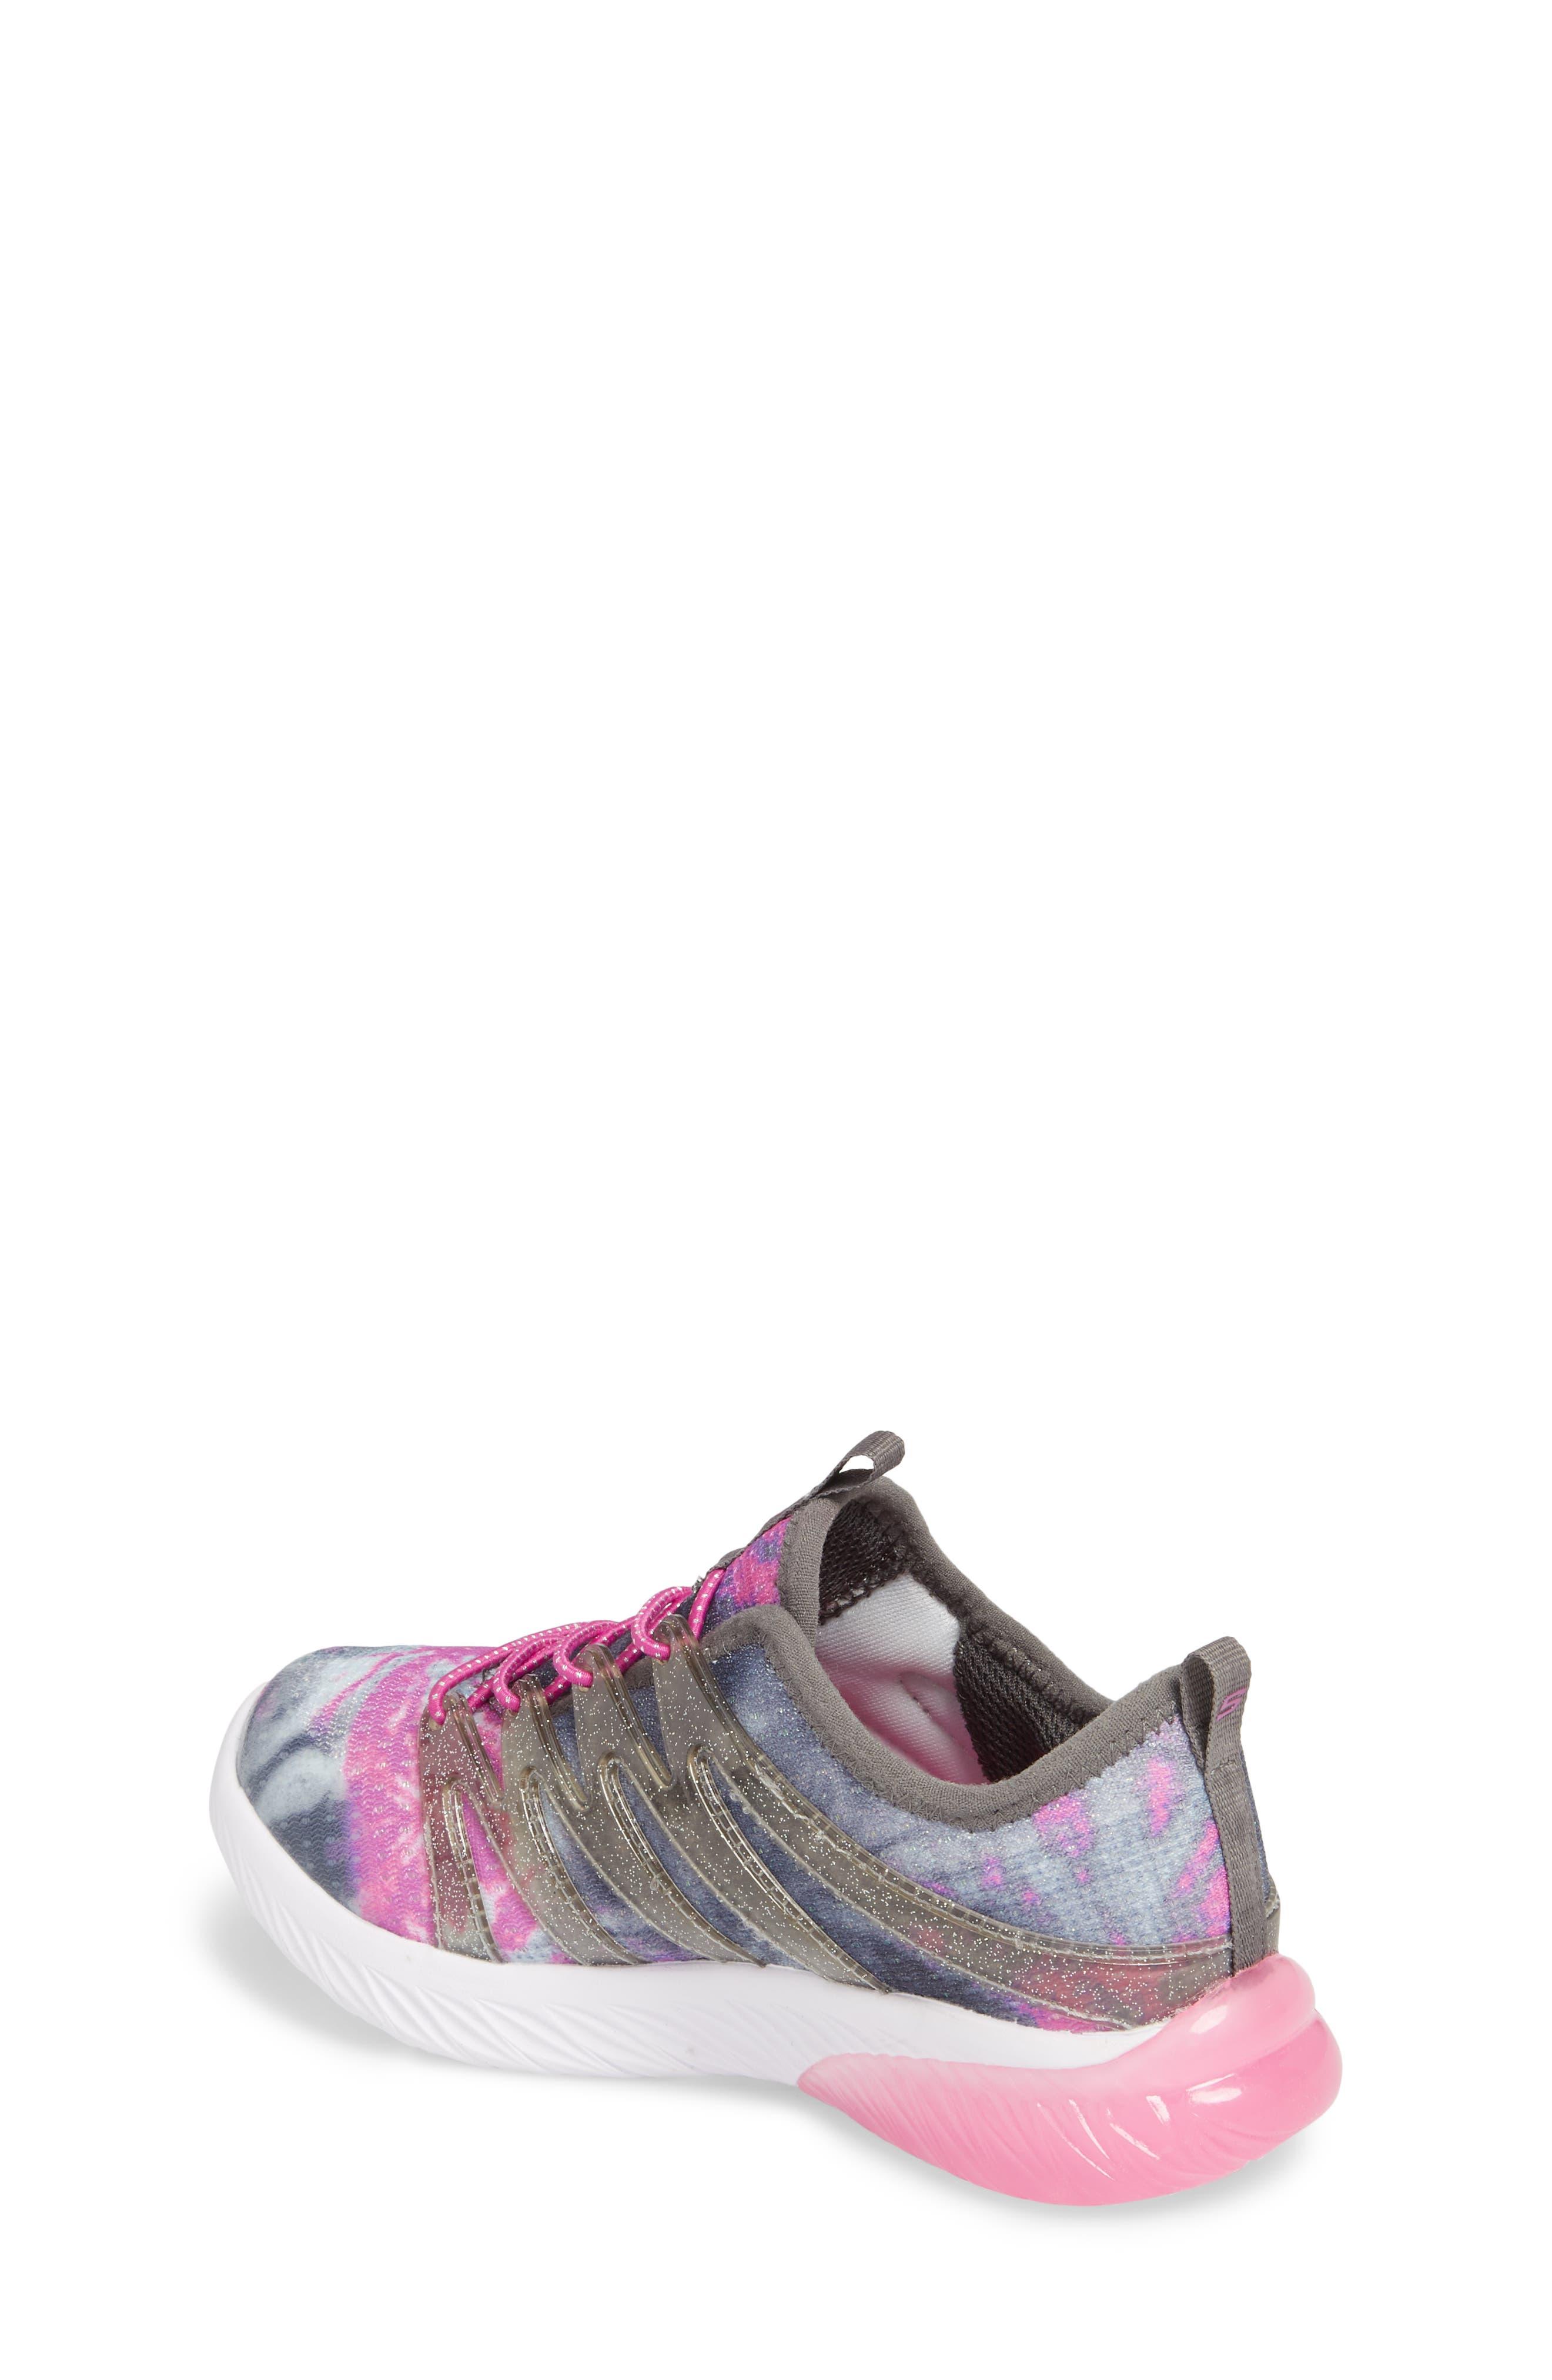 Skech Gem Glitter Sneaker,                             Alternate thumbnail 2, color,                             Charcoal/ Hot Pink